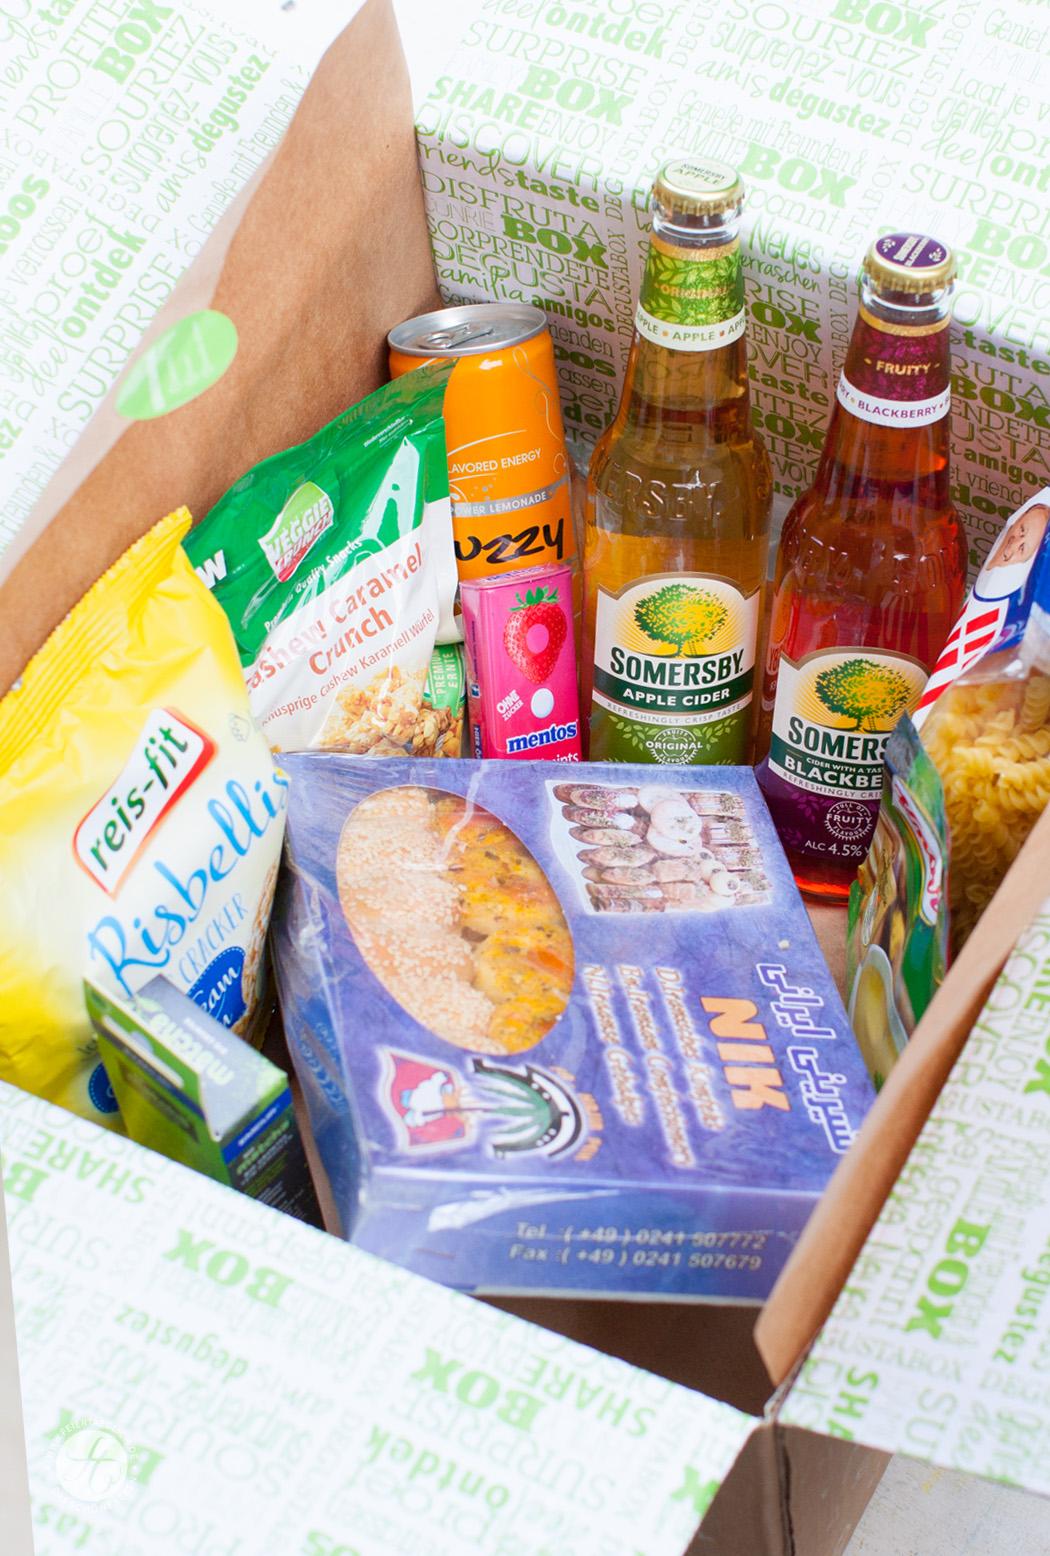 Degusta Box Juni 2015